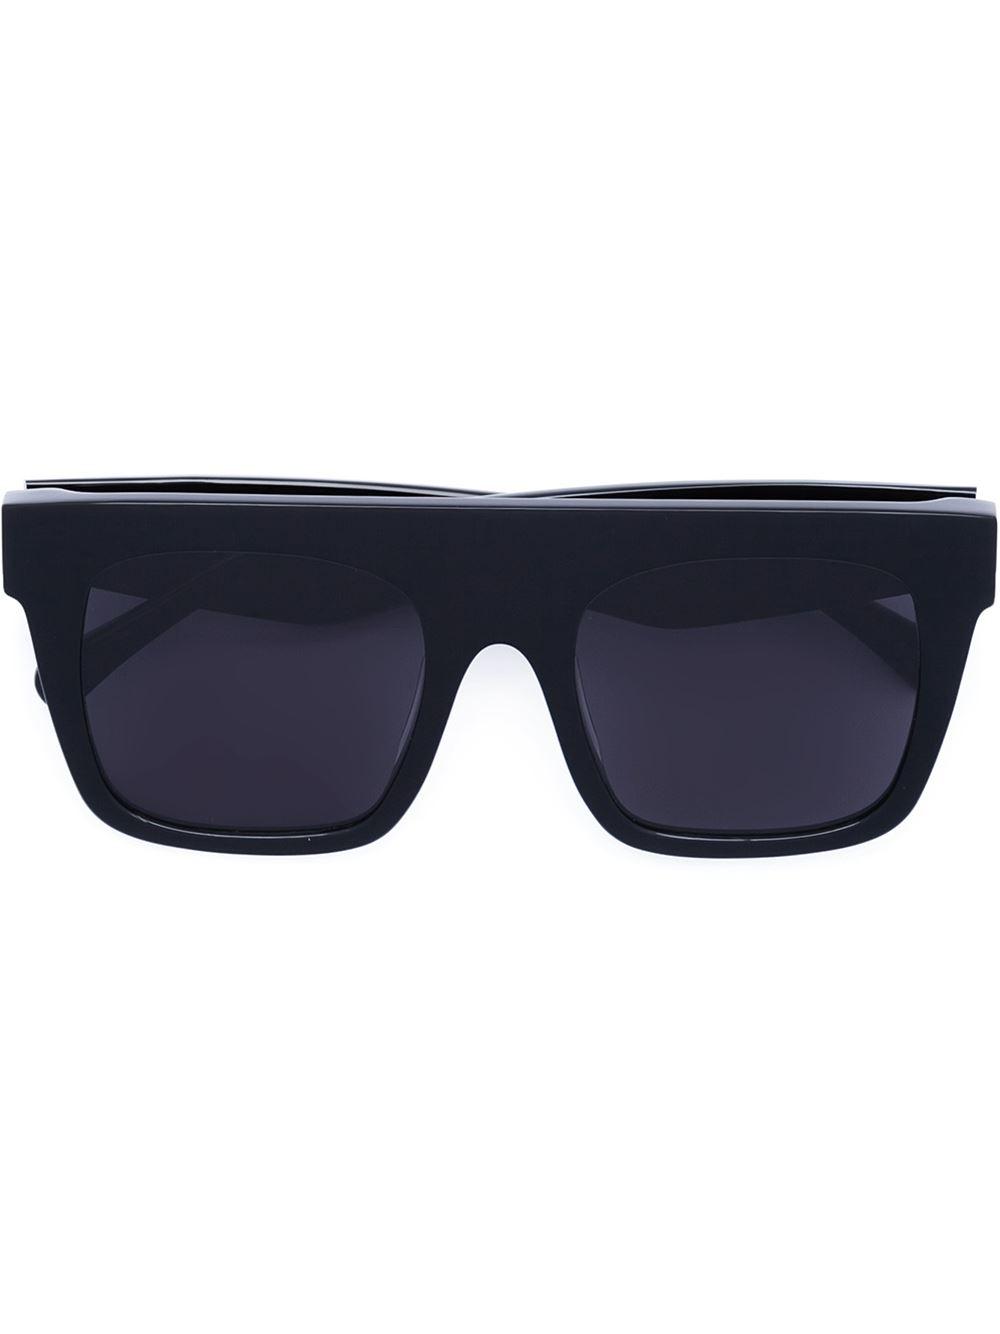 Black Frame Square Glasses : Vera wang Square Frame Sunglasses in Black Lyst